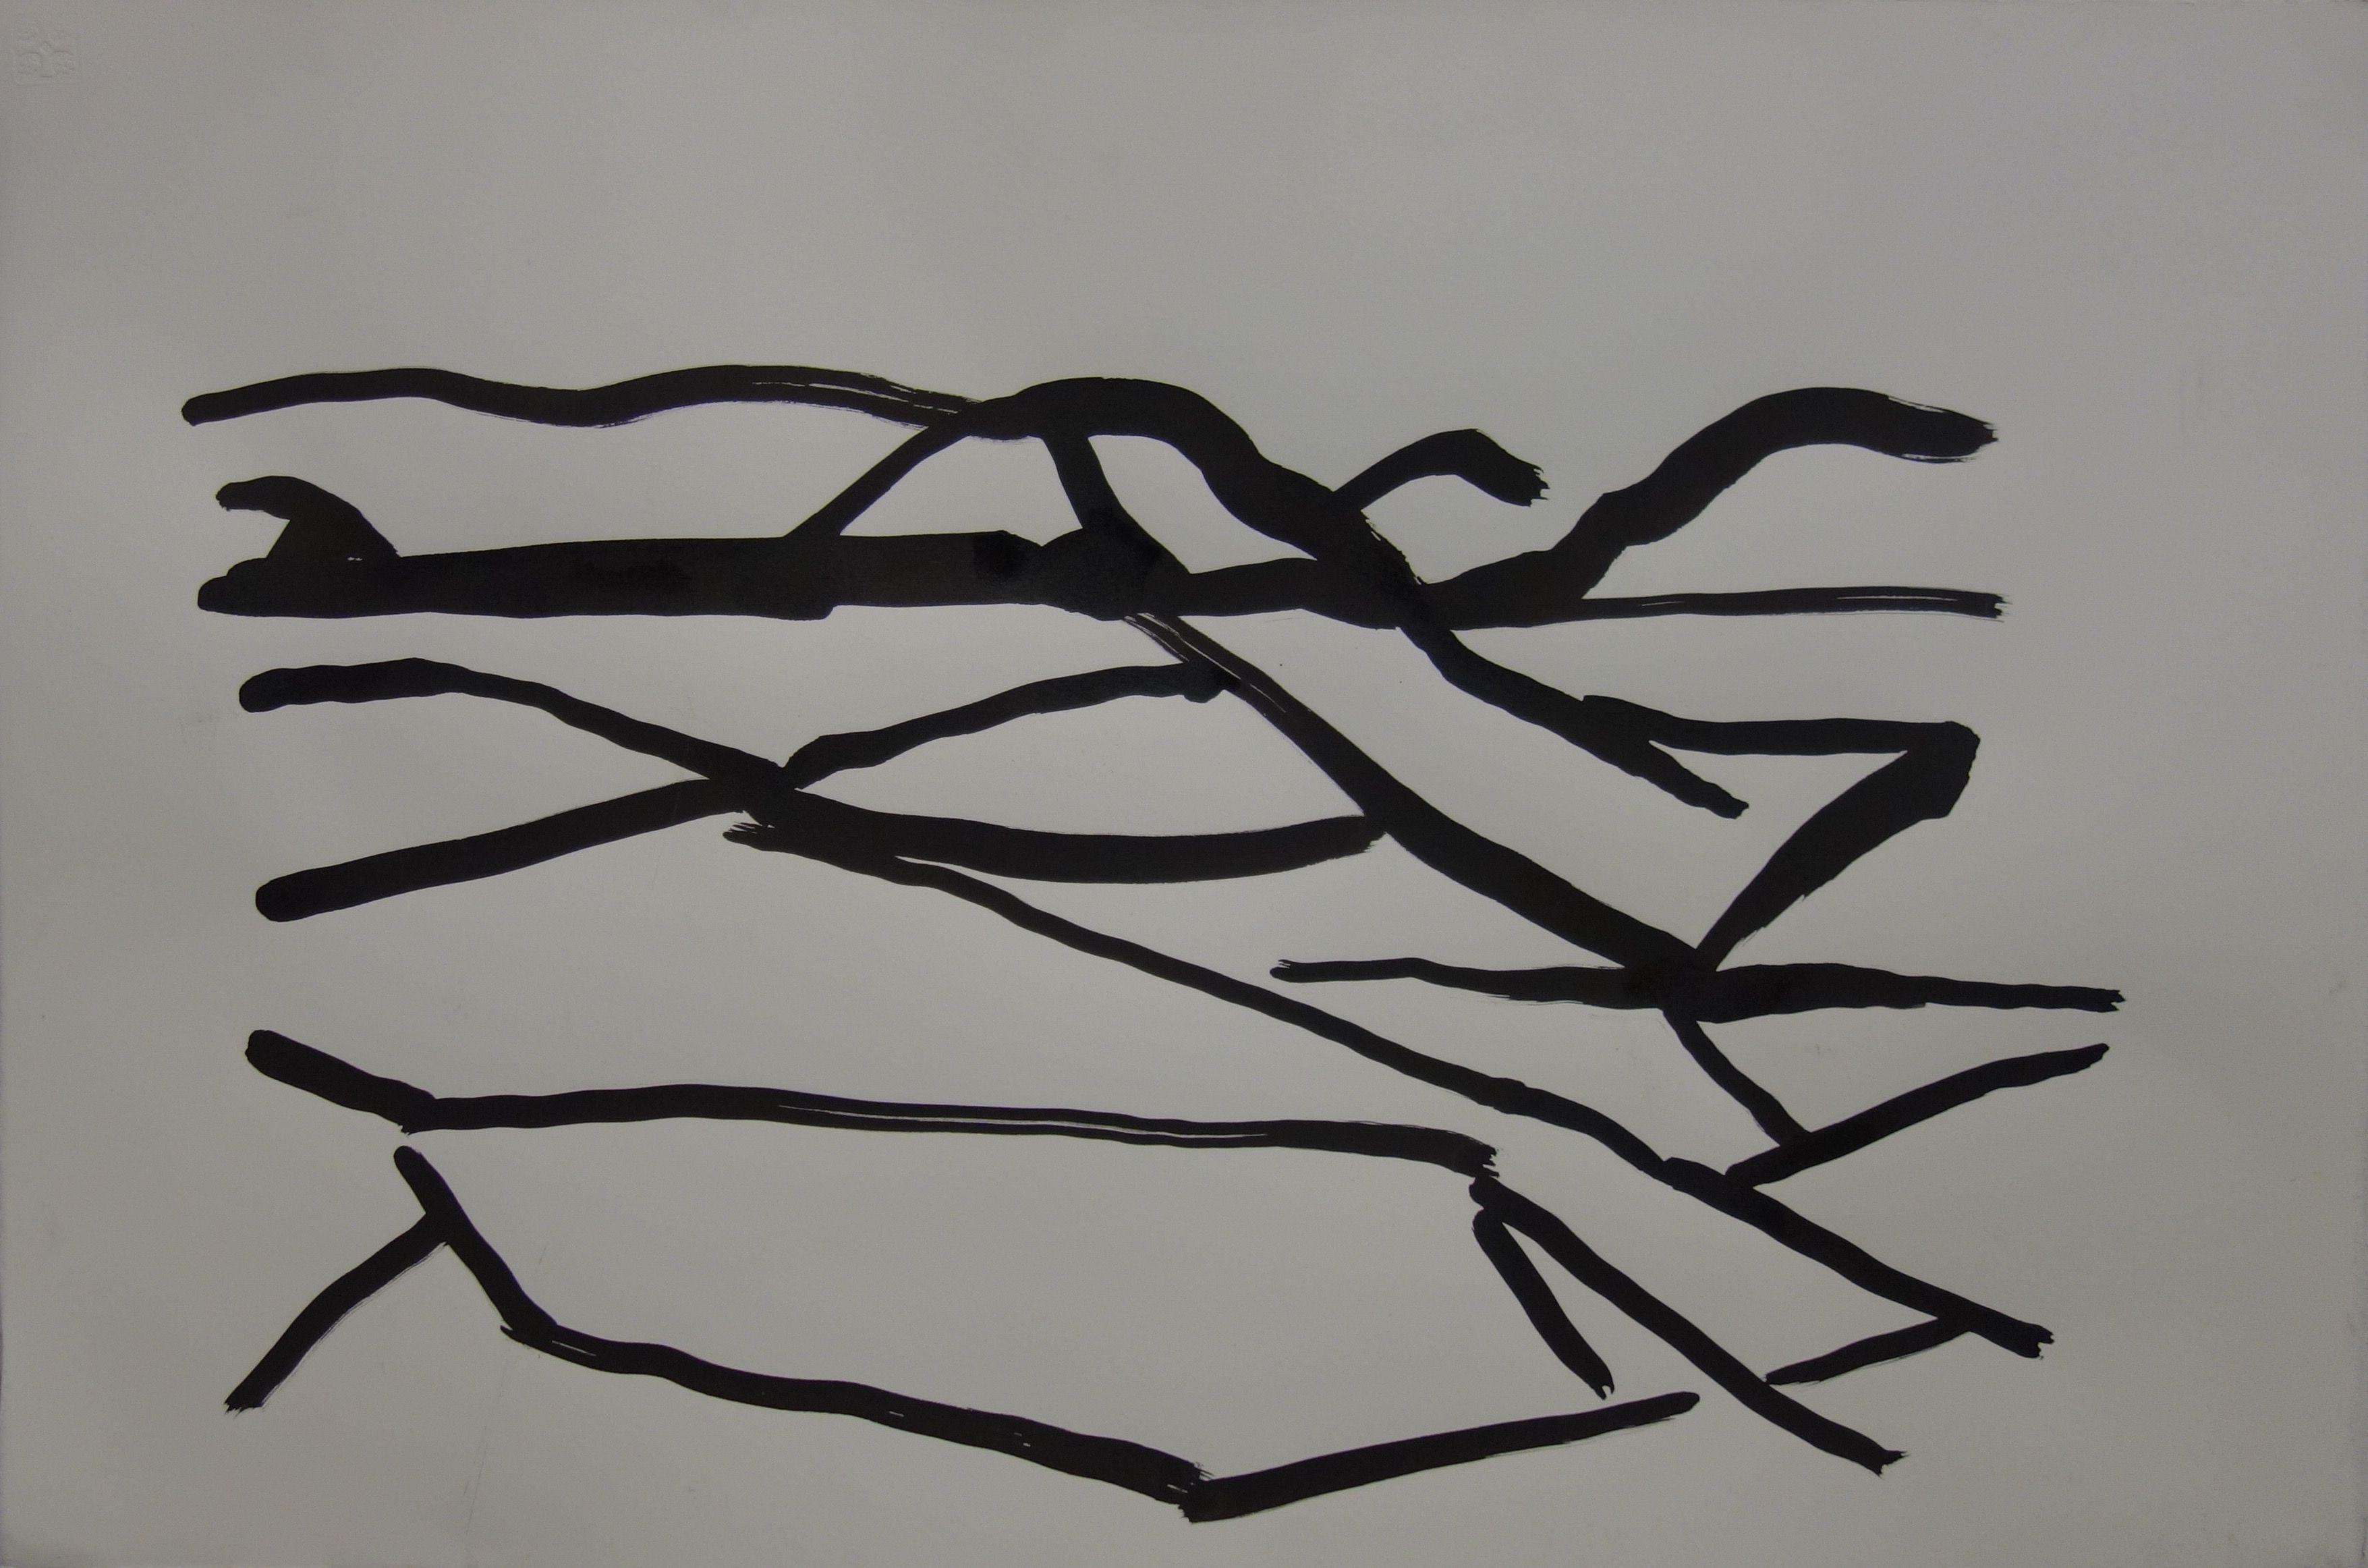 Islossning, tusch, 38x56cm